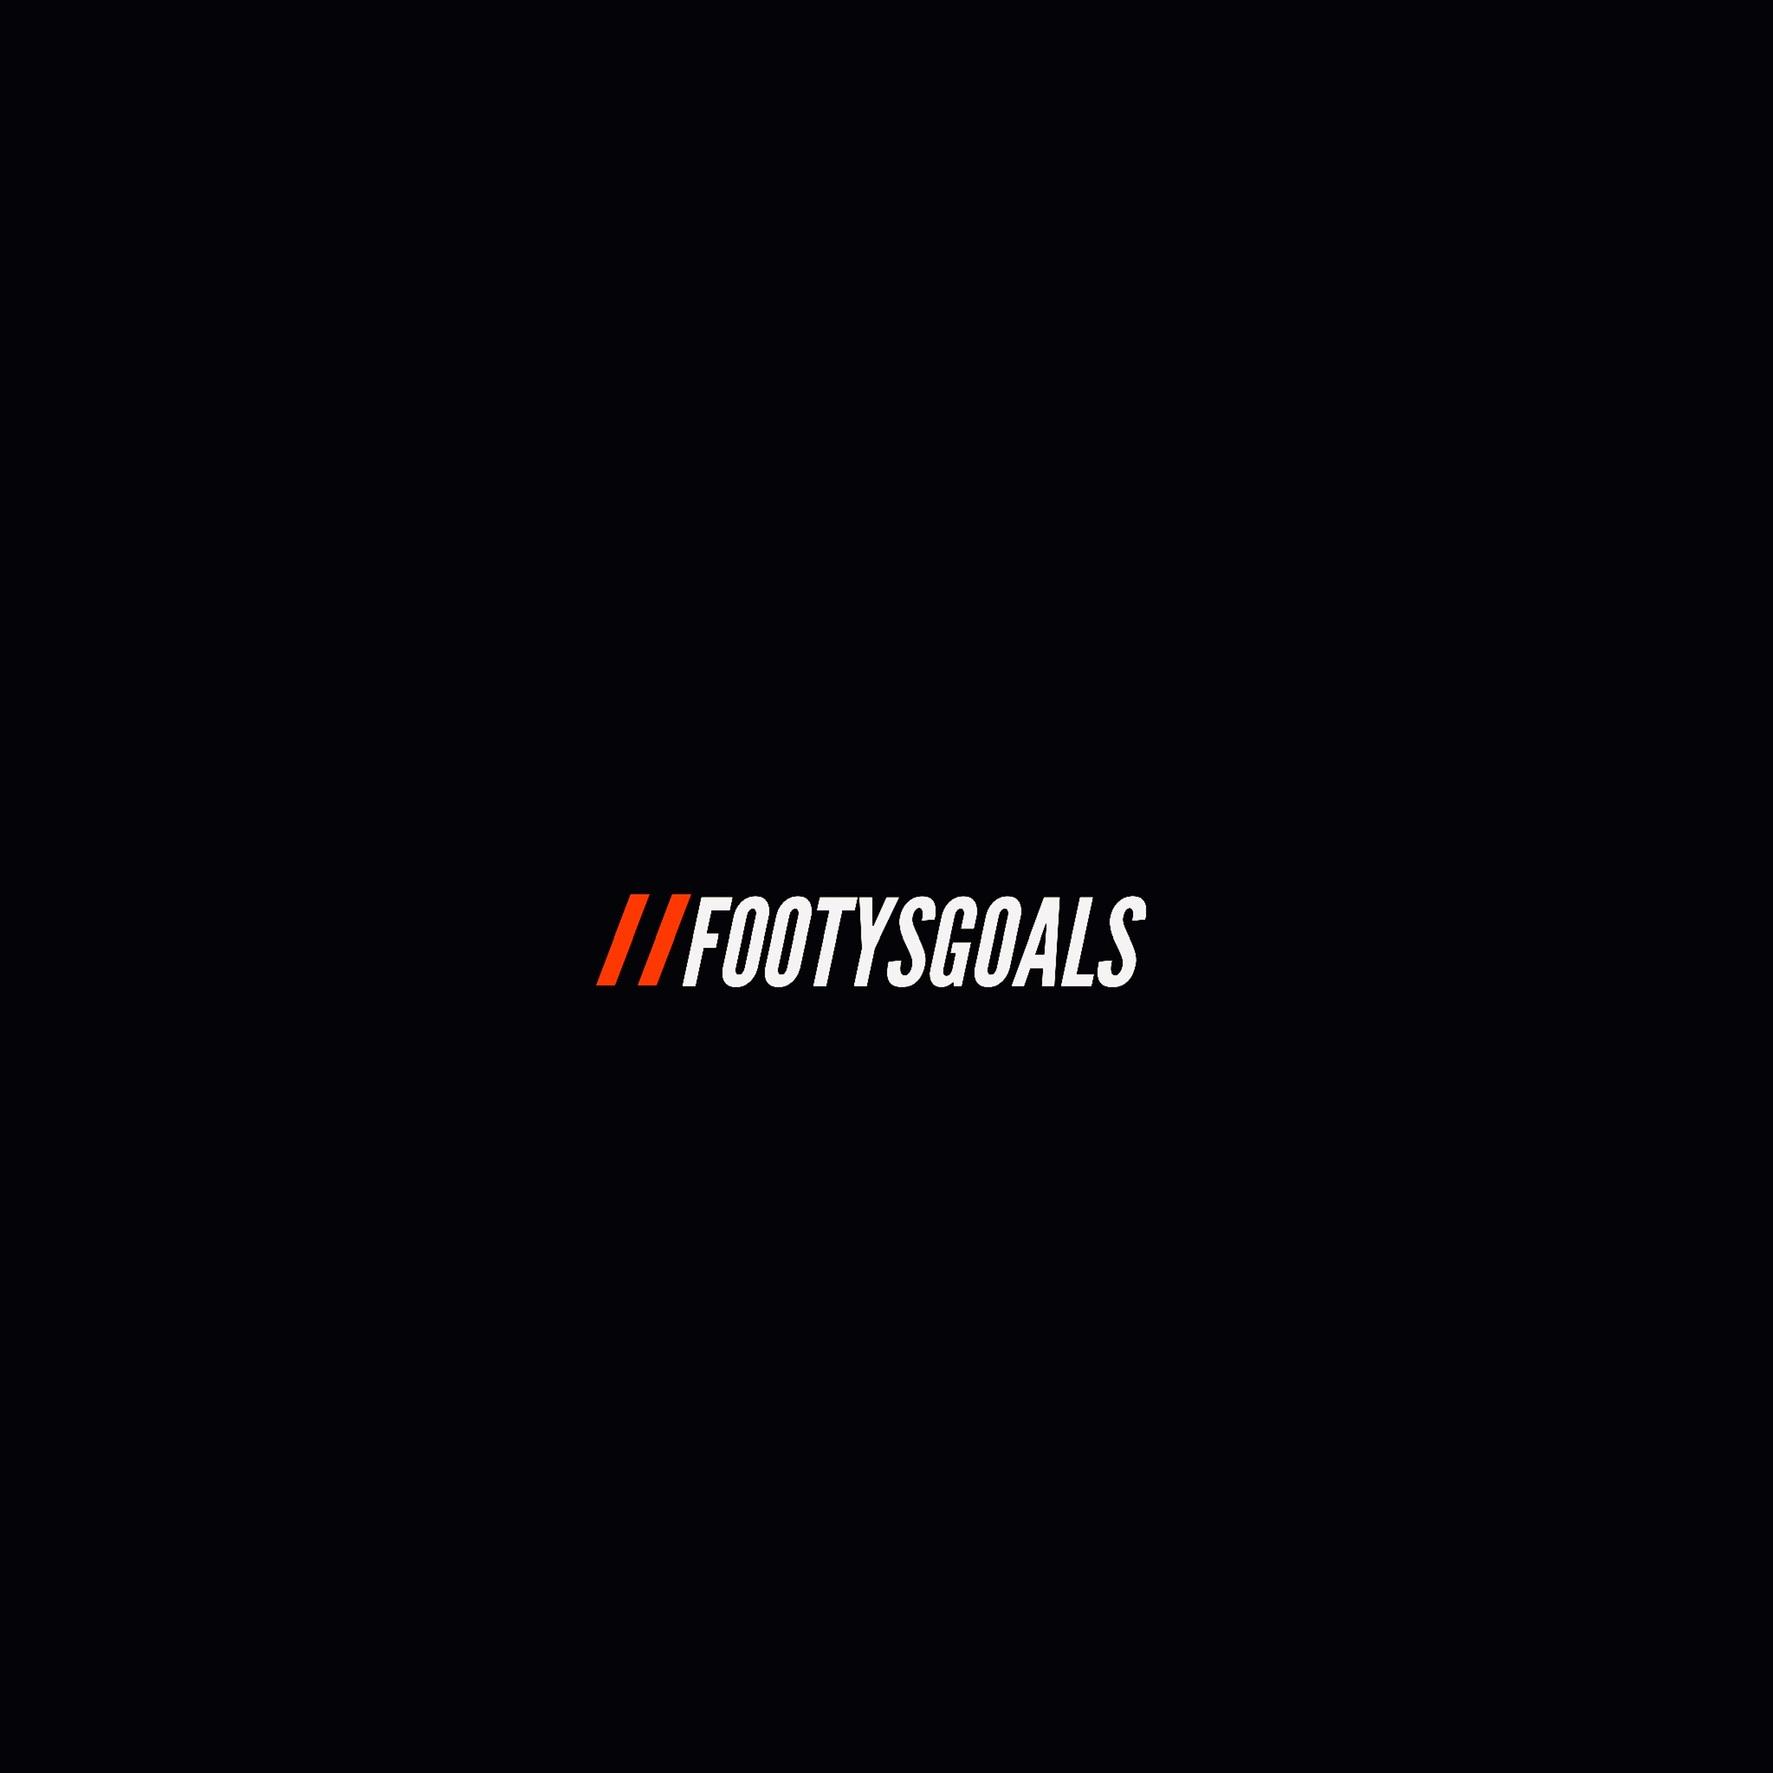 Footysgoals  Image